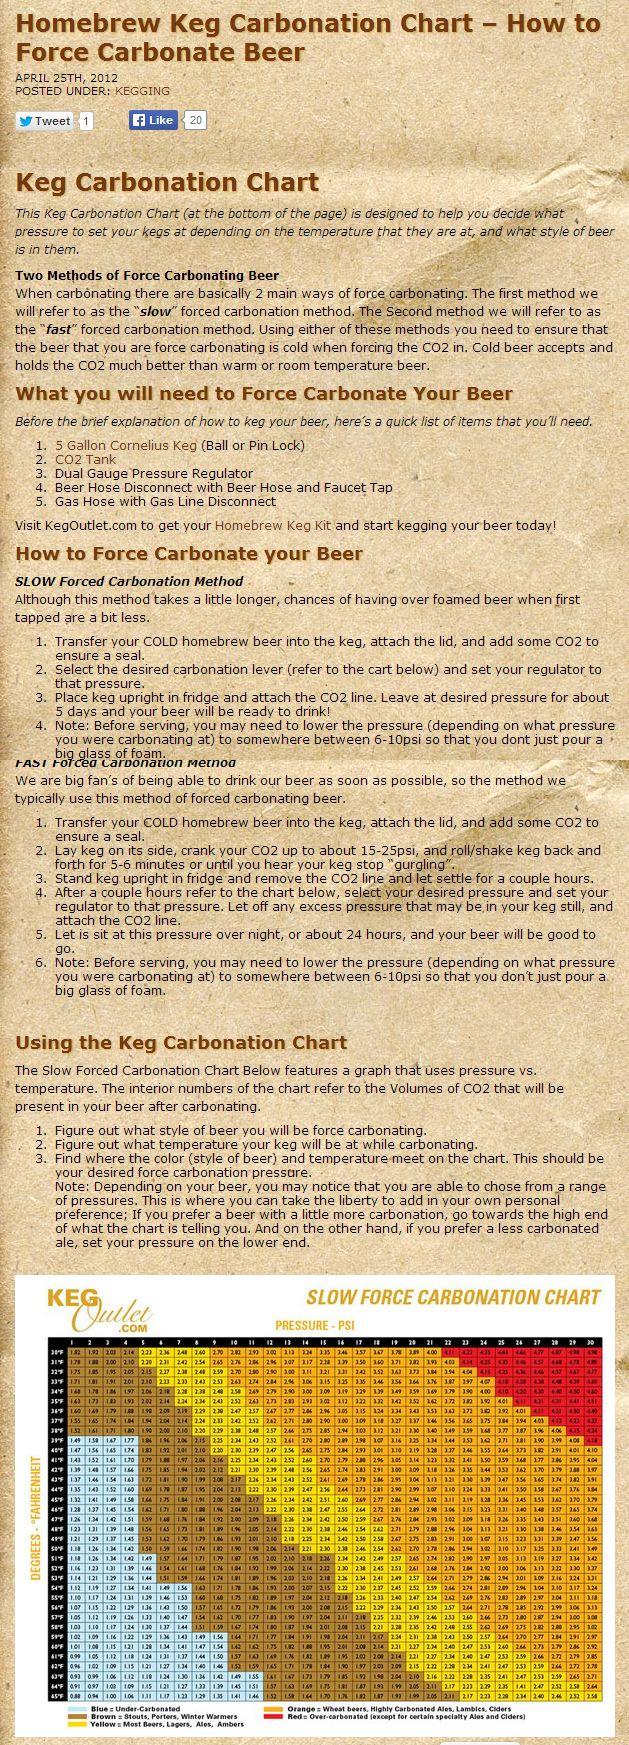 Best 25 homebrew keg ideas on pinterest the homebrewery diy homebrew keg carbonation chart how to force carbonate beer nvjuhfo Images